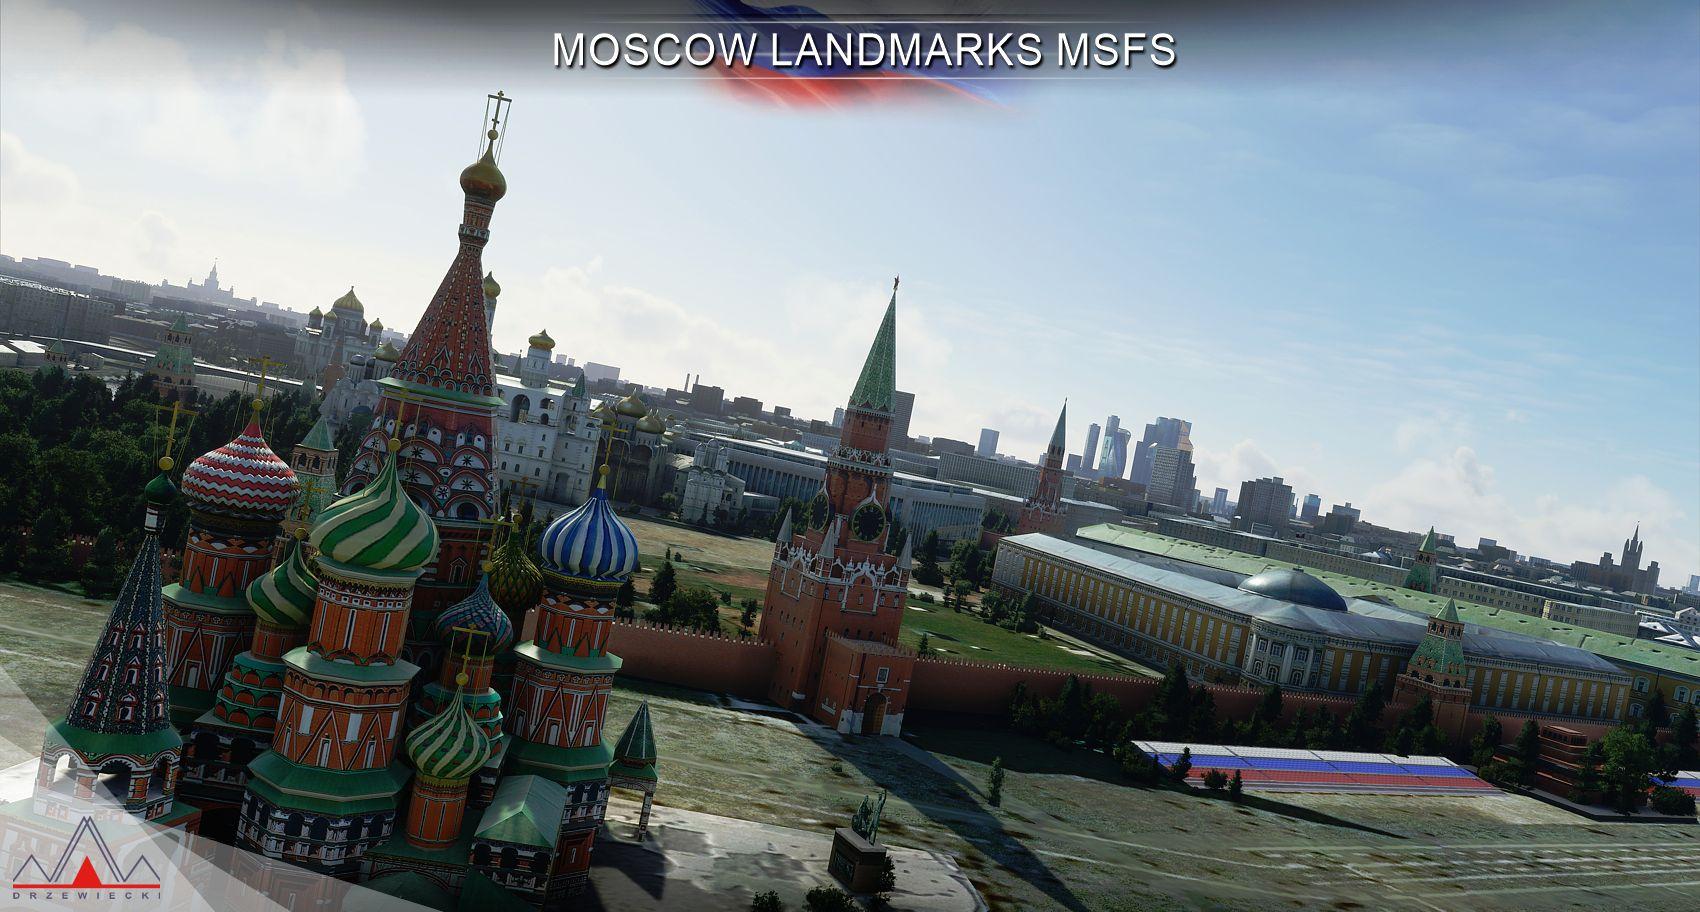 MSFS Moscow Landmarks